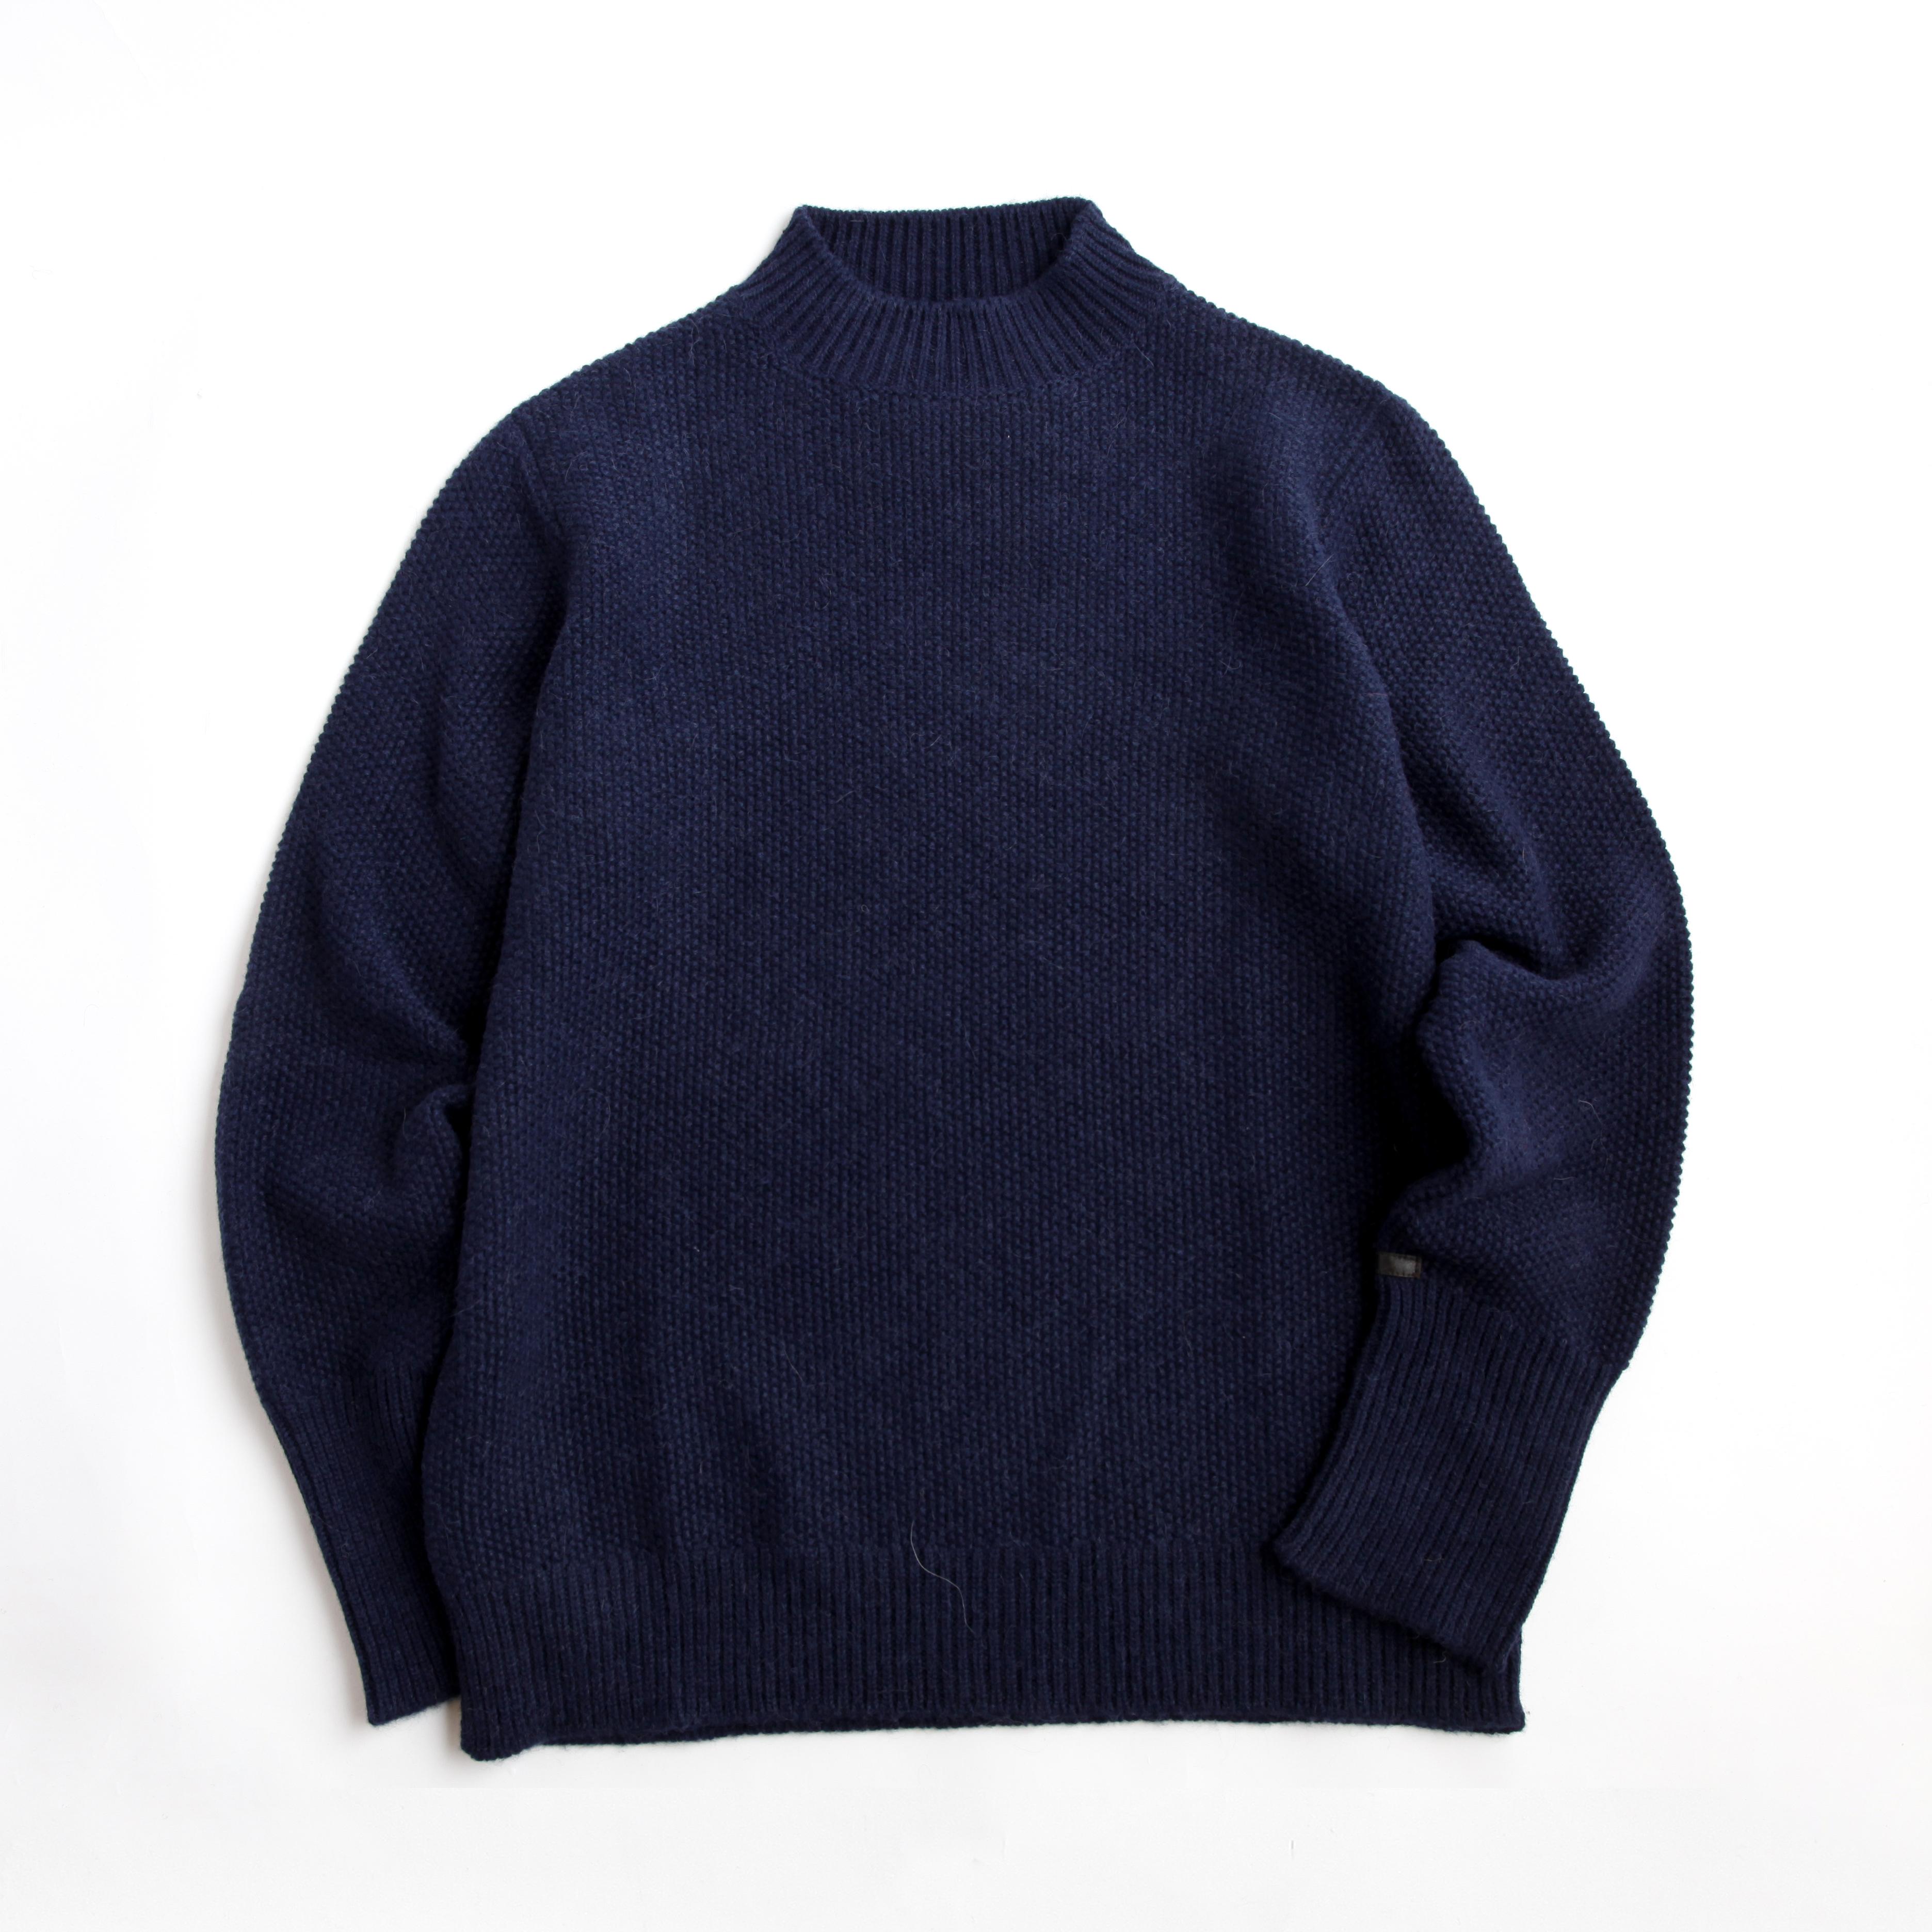 THE INOUE BROTHERS/Low Gauge/Mock Neck Sweater/Navy